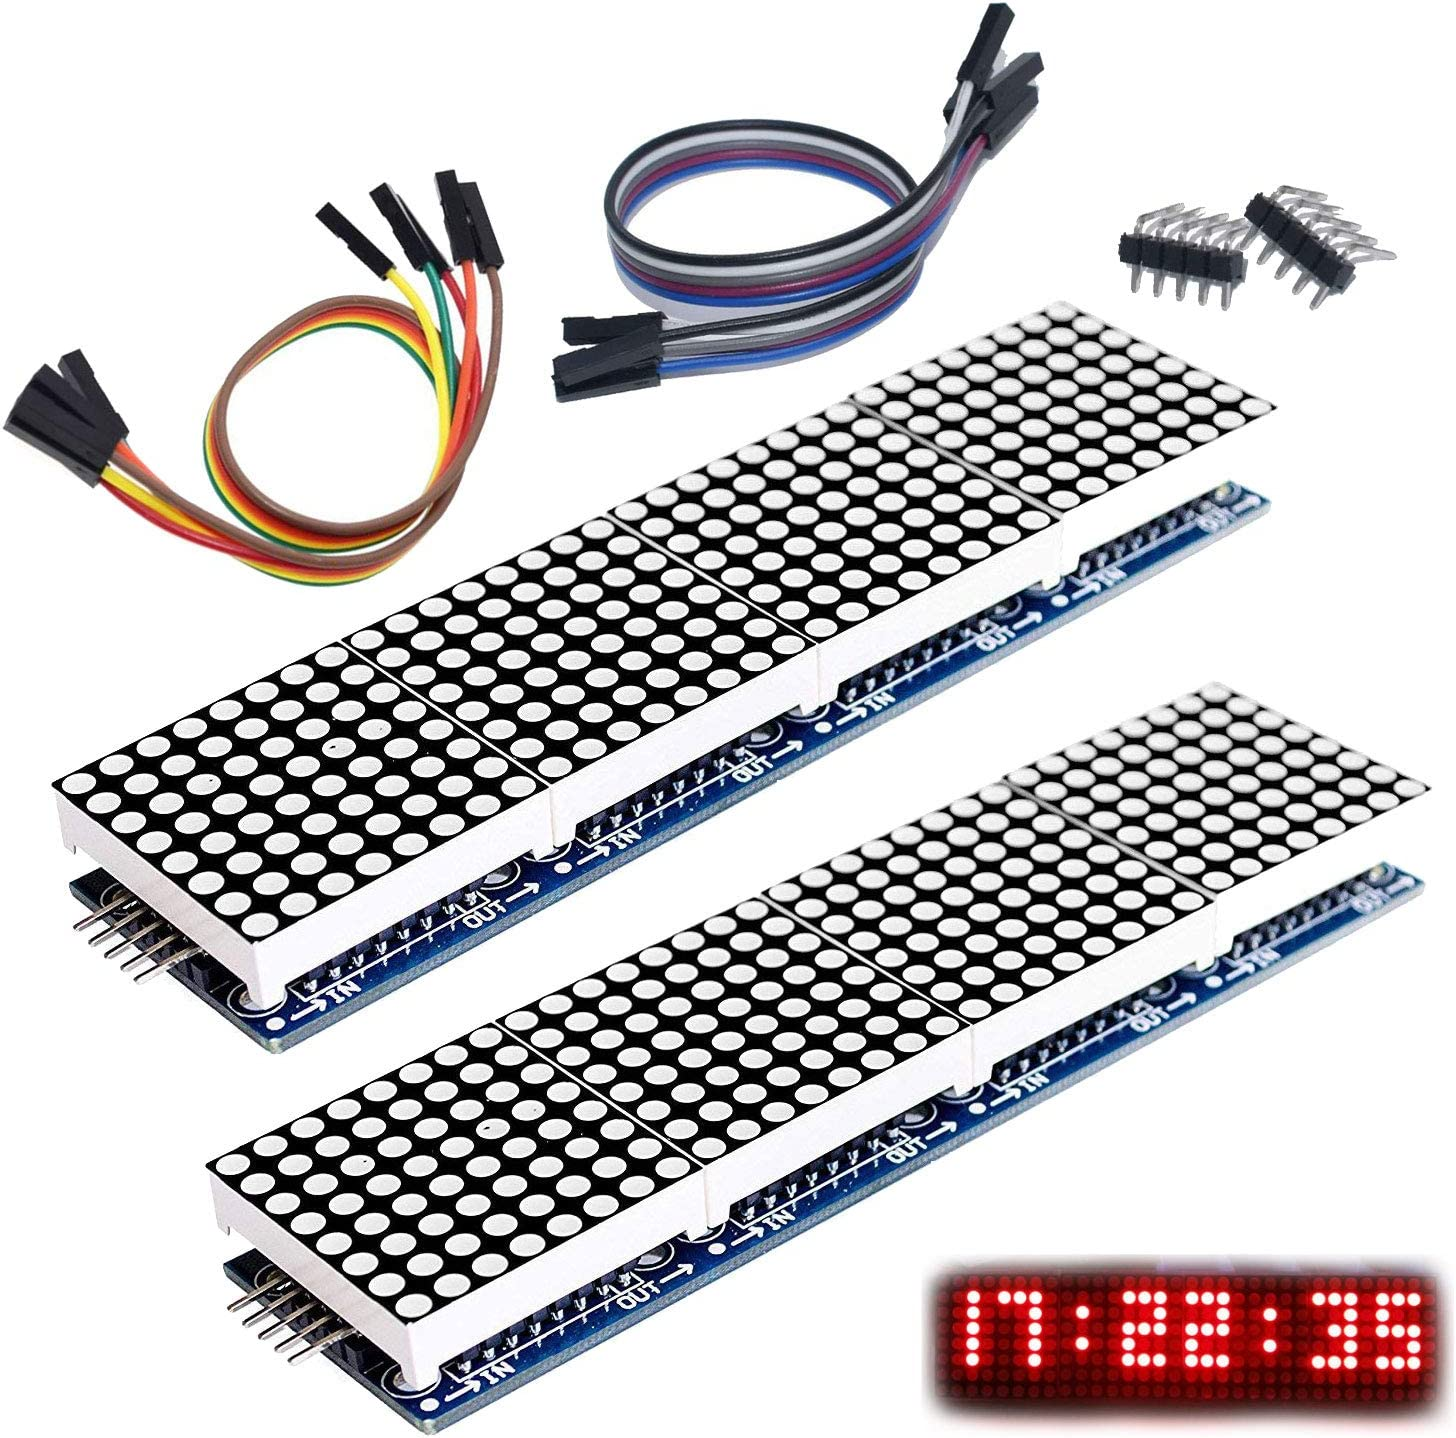 ALAMSCN MAX7219 Dot Popular popular Matrix Module 32x8 LED Award-winning store Display 4 1 in